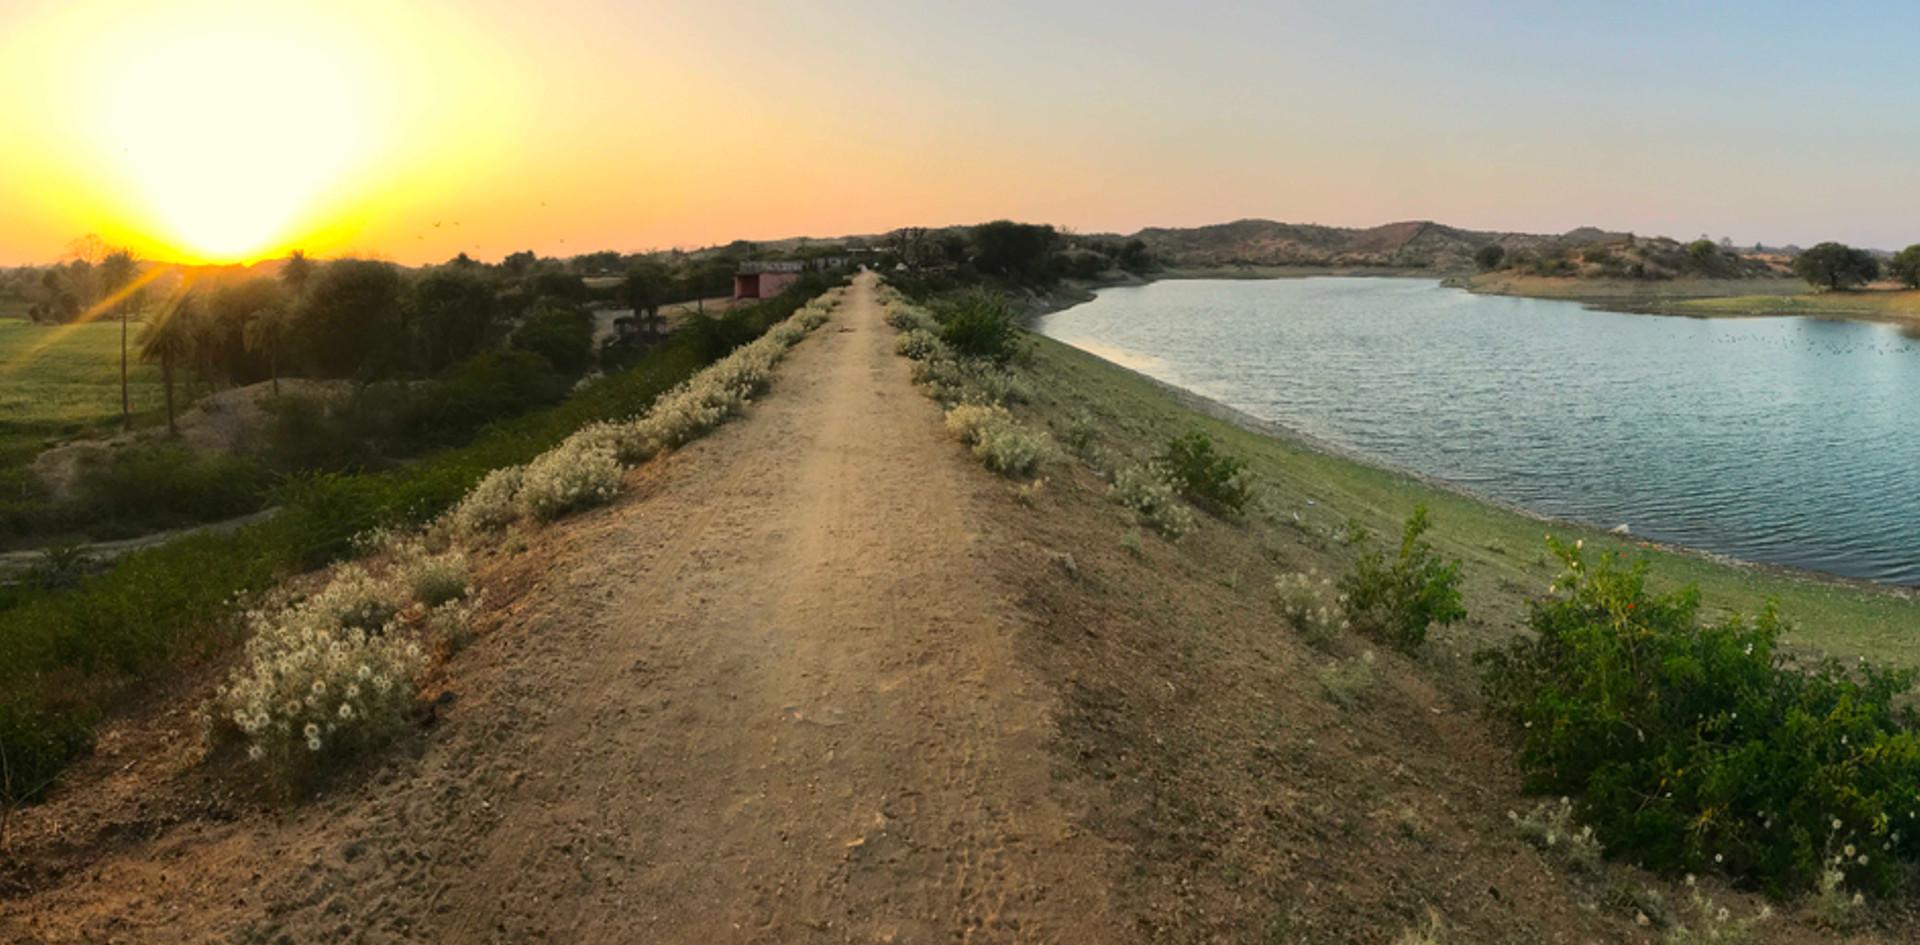 PANORAMA-SCENERY-LAKE-RAJASTHAN-HILLS_SU